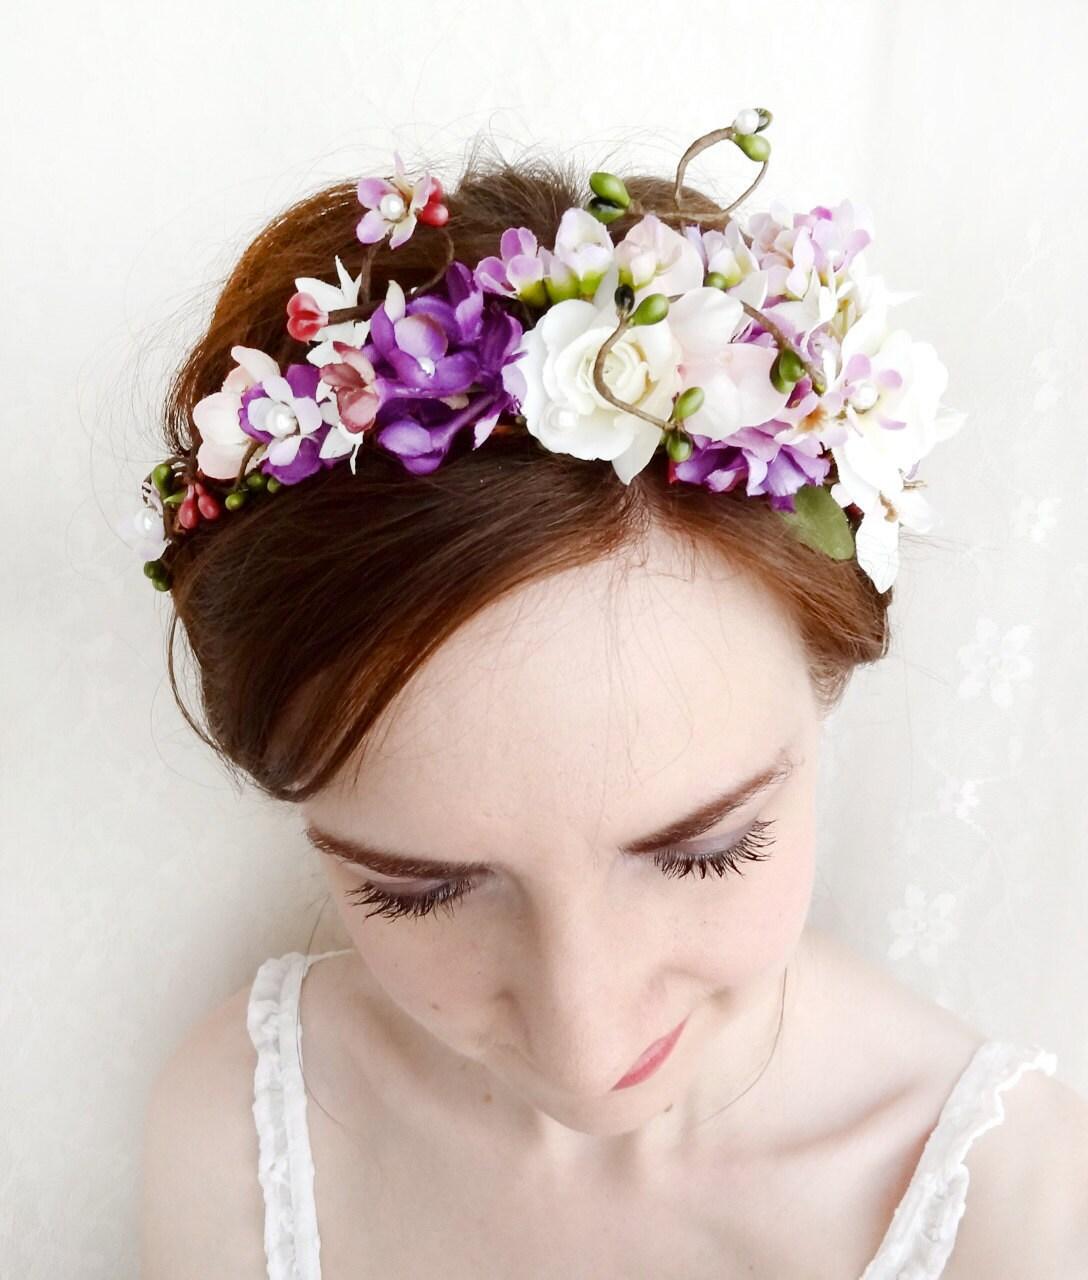 Bridal Flower Wreath For Hair : Bridal flower wreath head purple floral by thehoneycomb